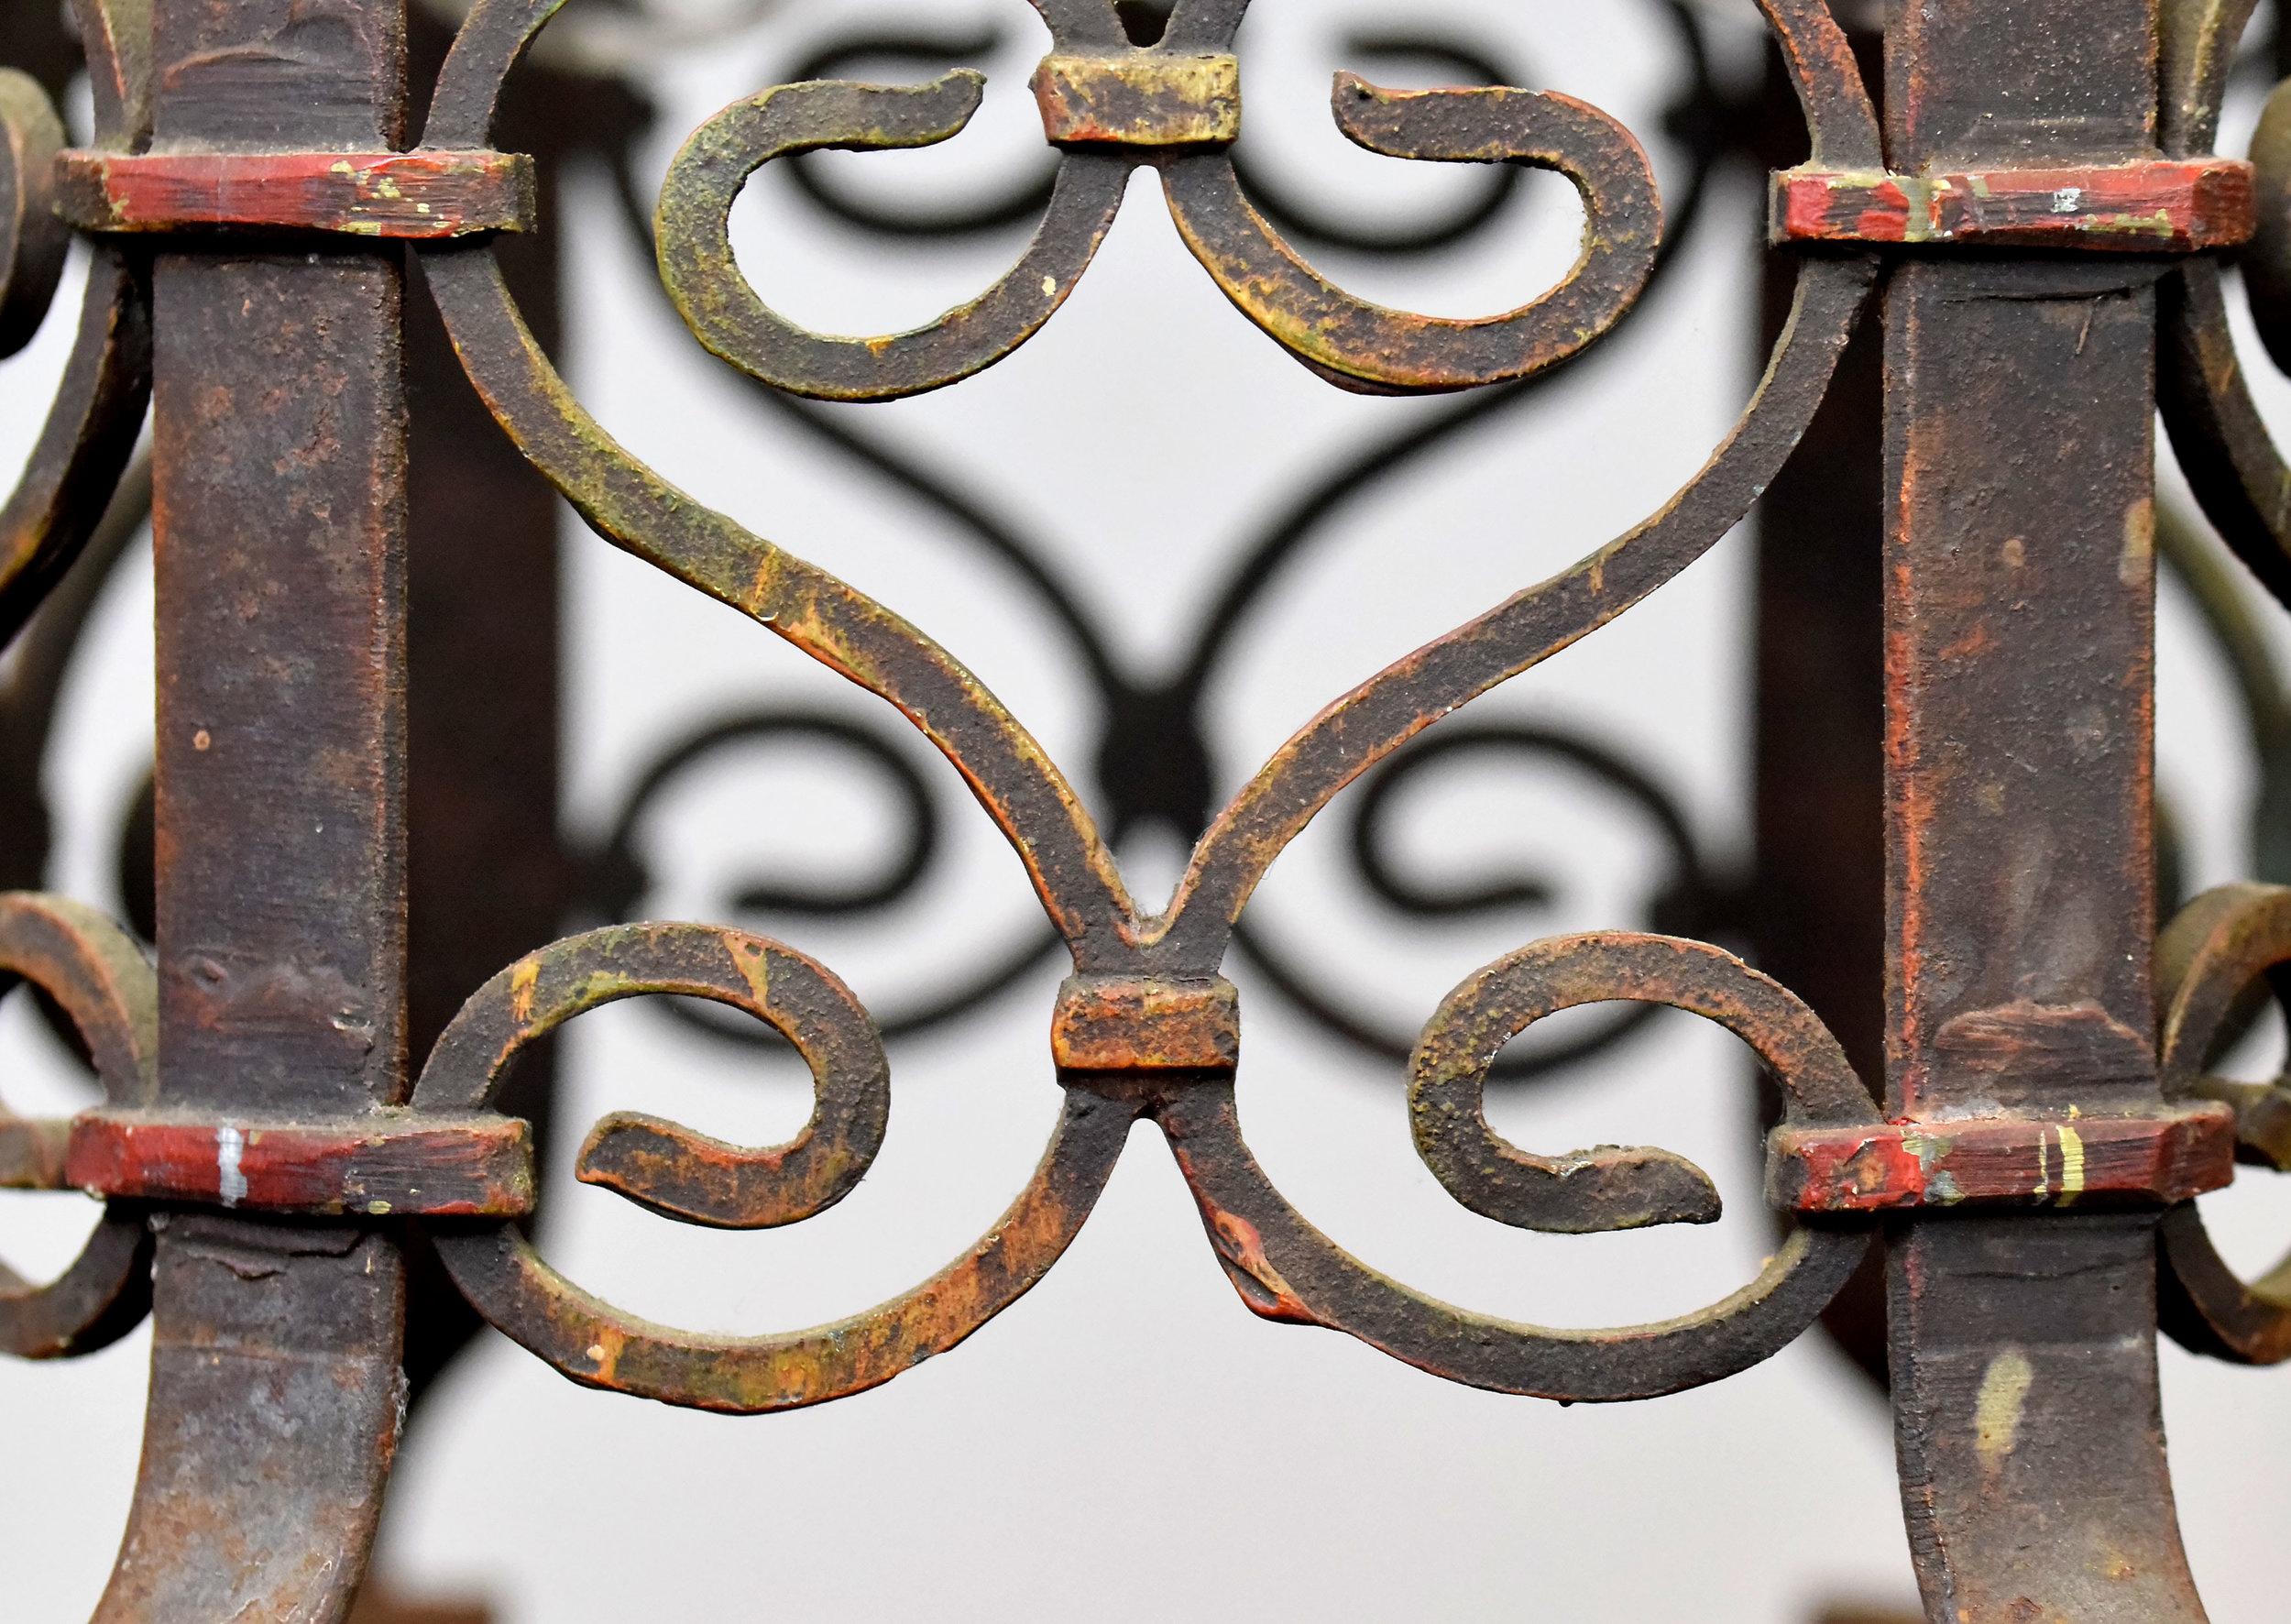 47444-painted-iron-chandelier-filigree.jpg